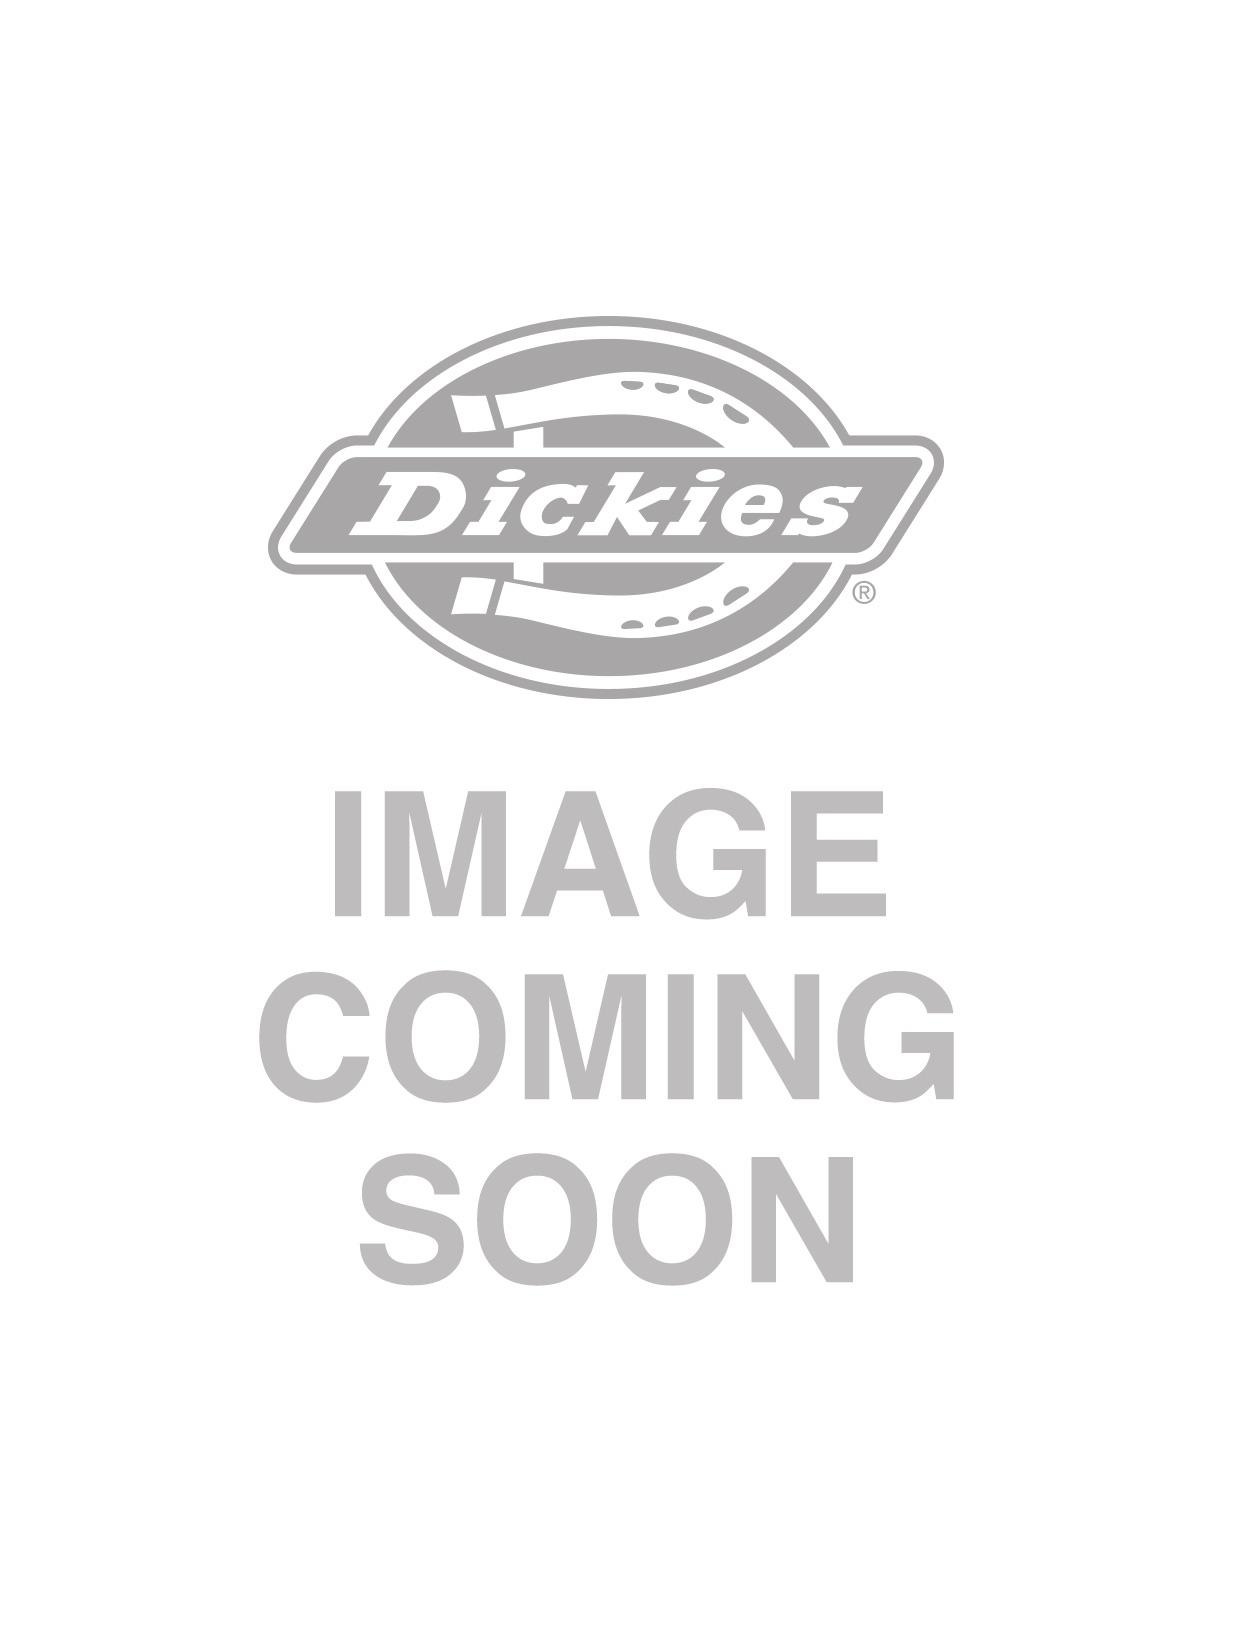 Dickies Hartsville